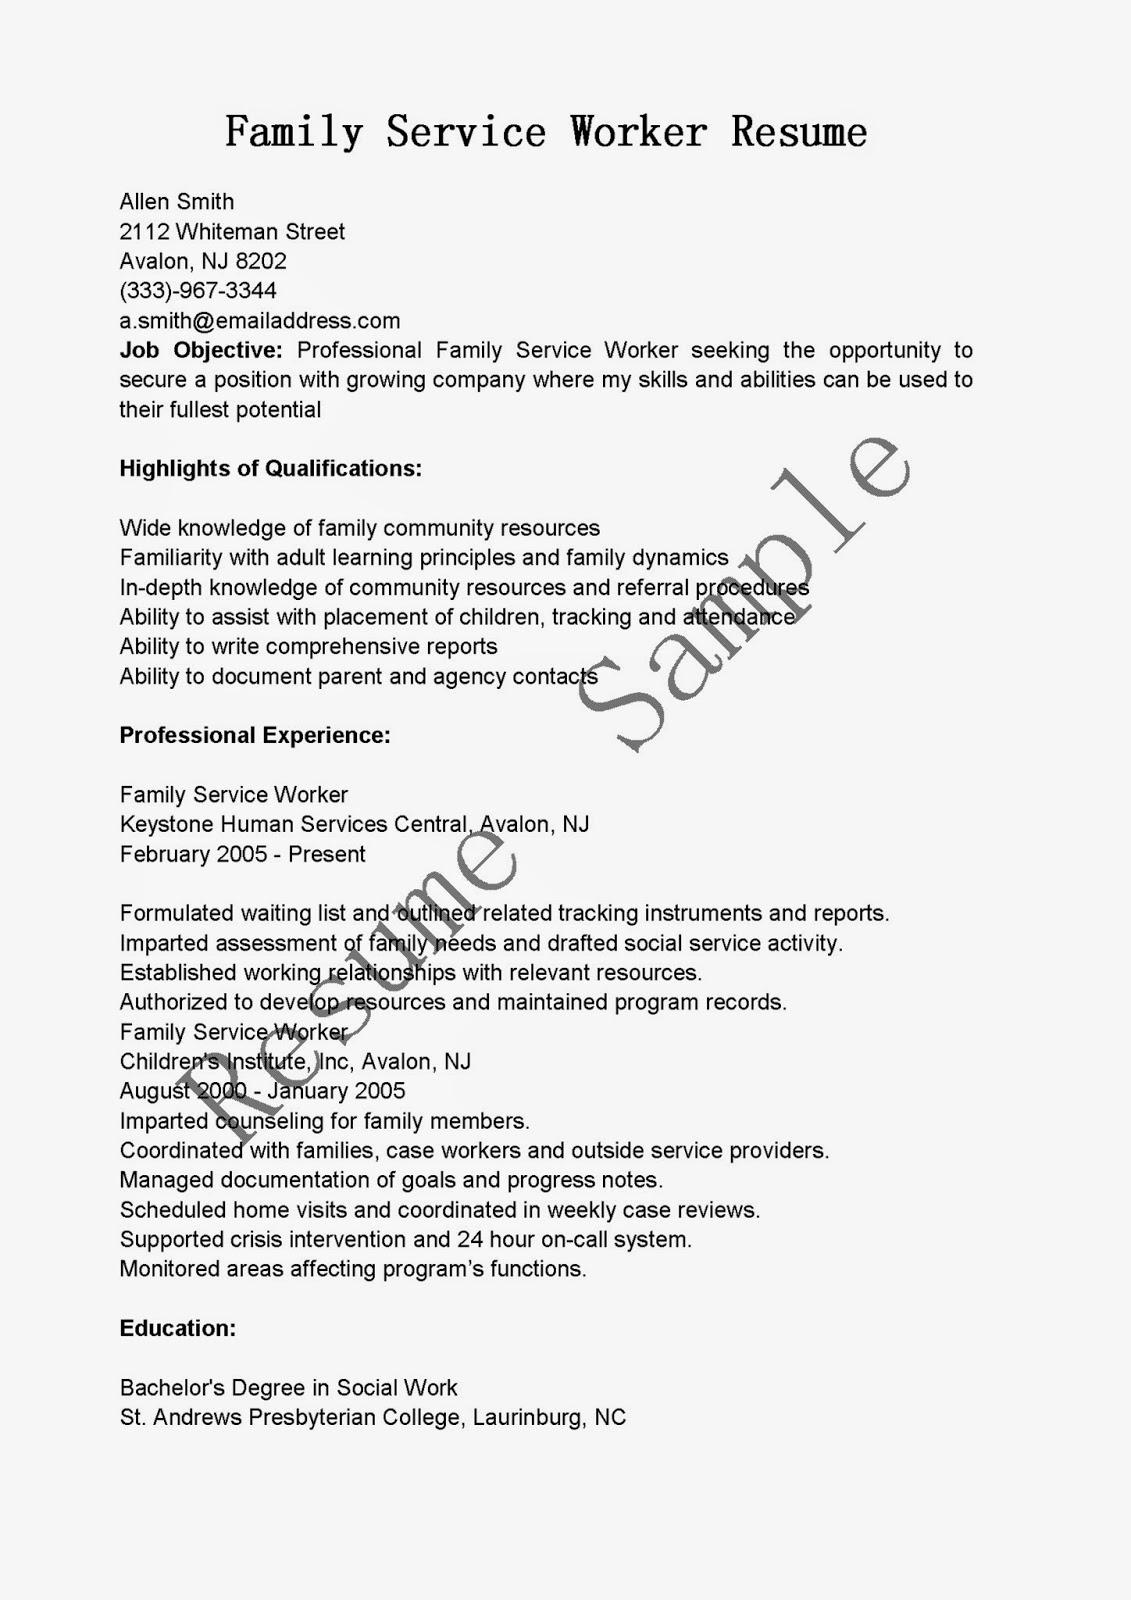 resume samples  family service worker resume sample